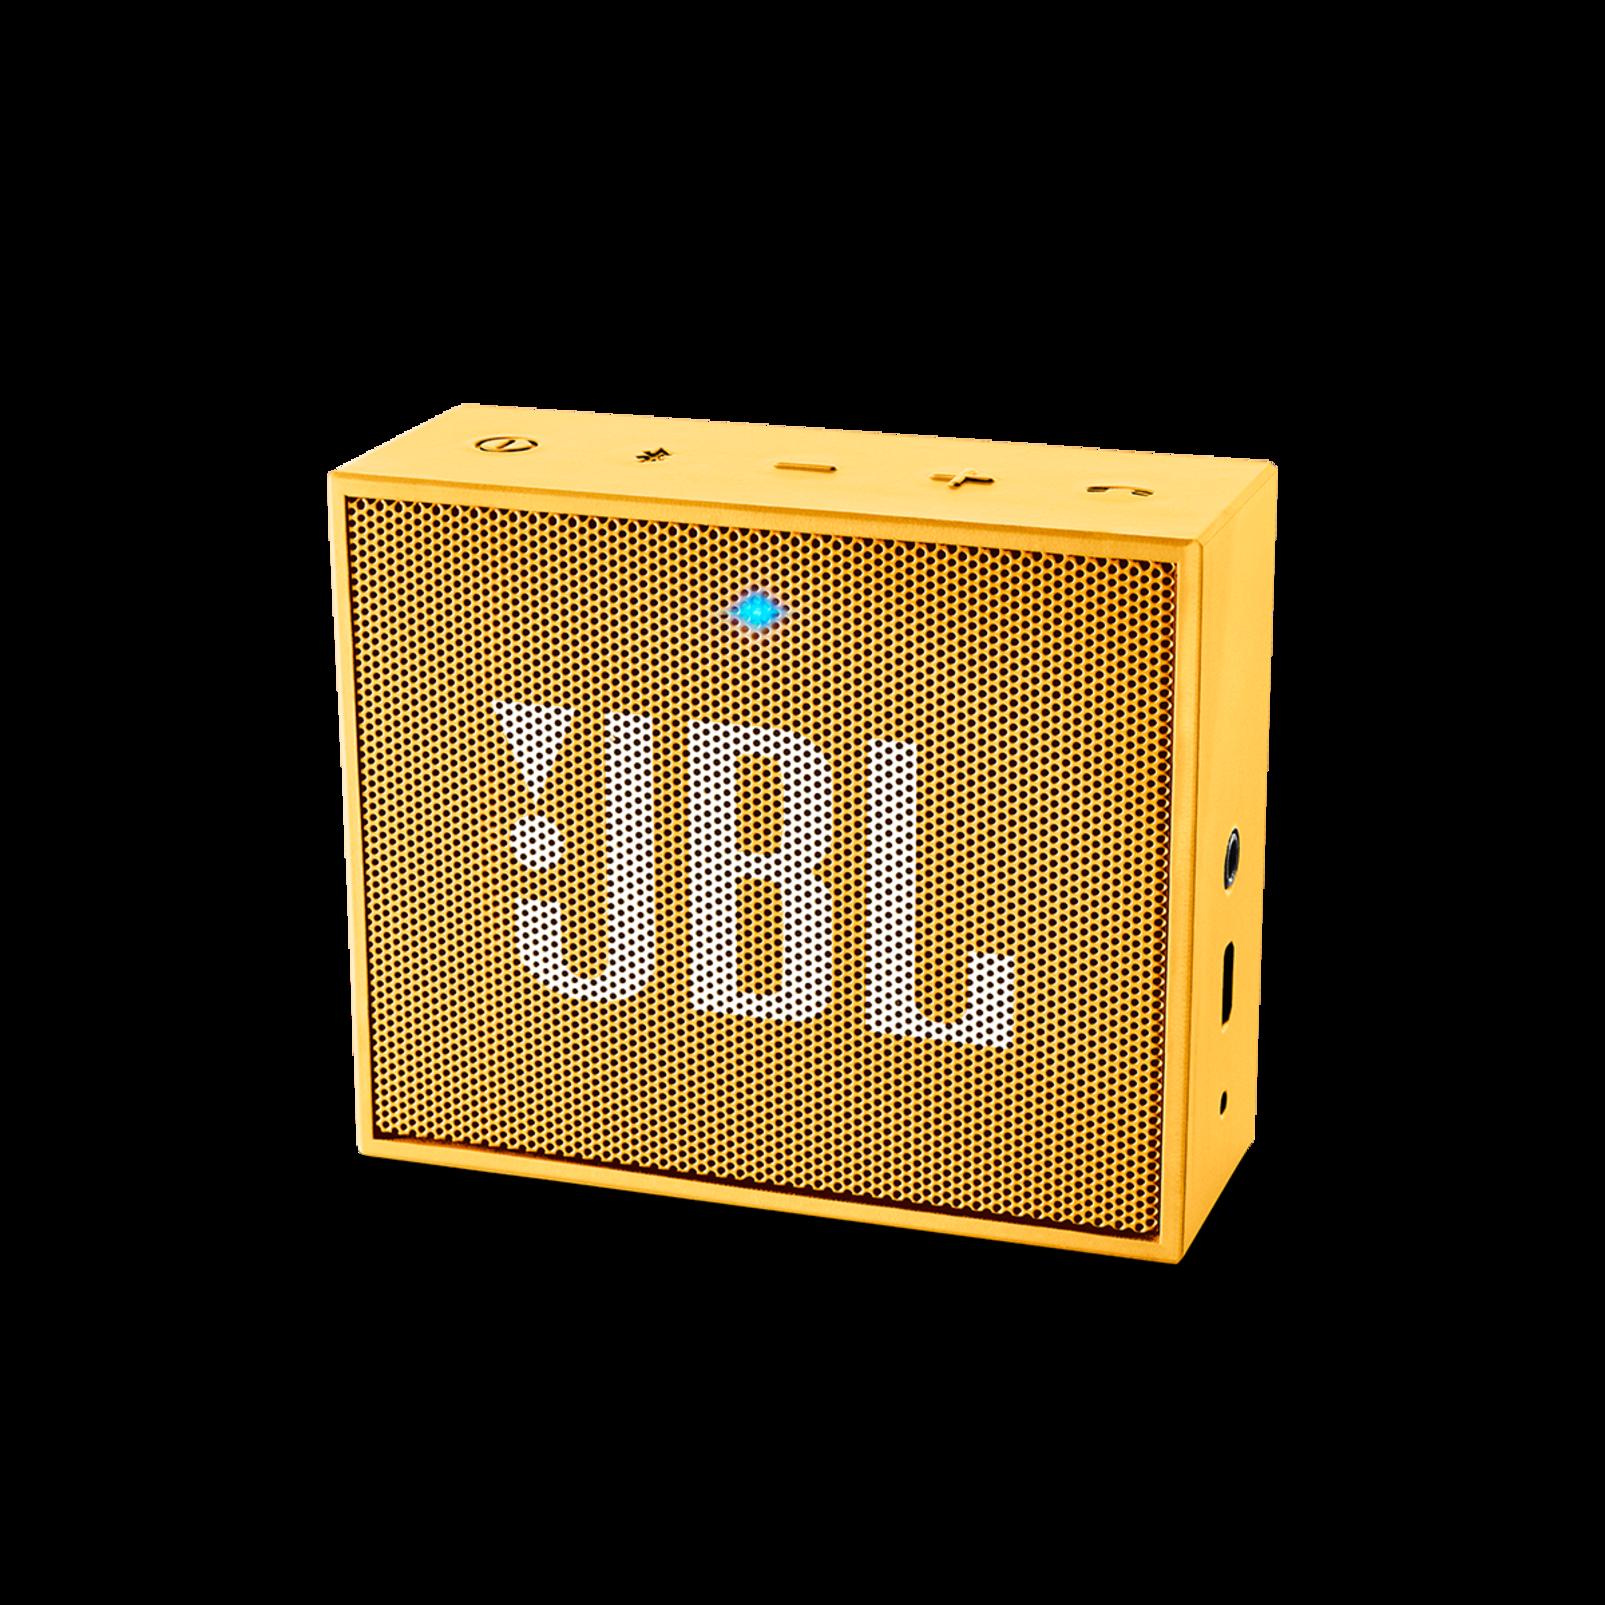 JBL GO - Yellow - Full-featured, great-sounding, great-value portable speaker - Hero